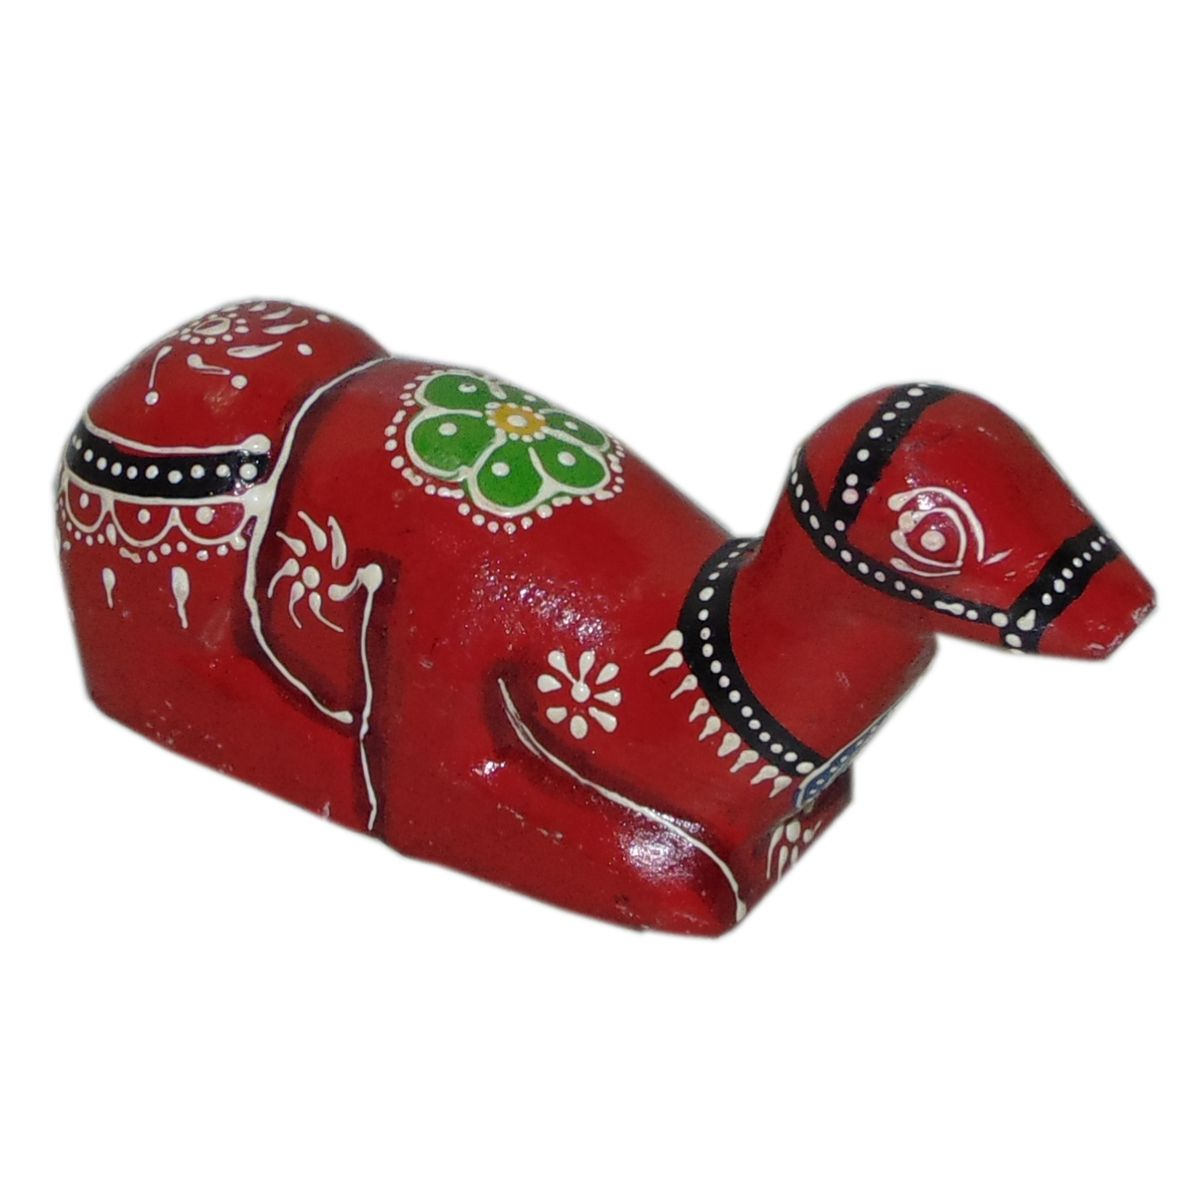 Akhani Handicrafts Multicolour Wood Handicraft Showpiece - Pack of 1